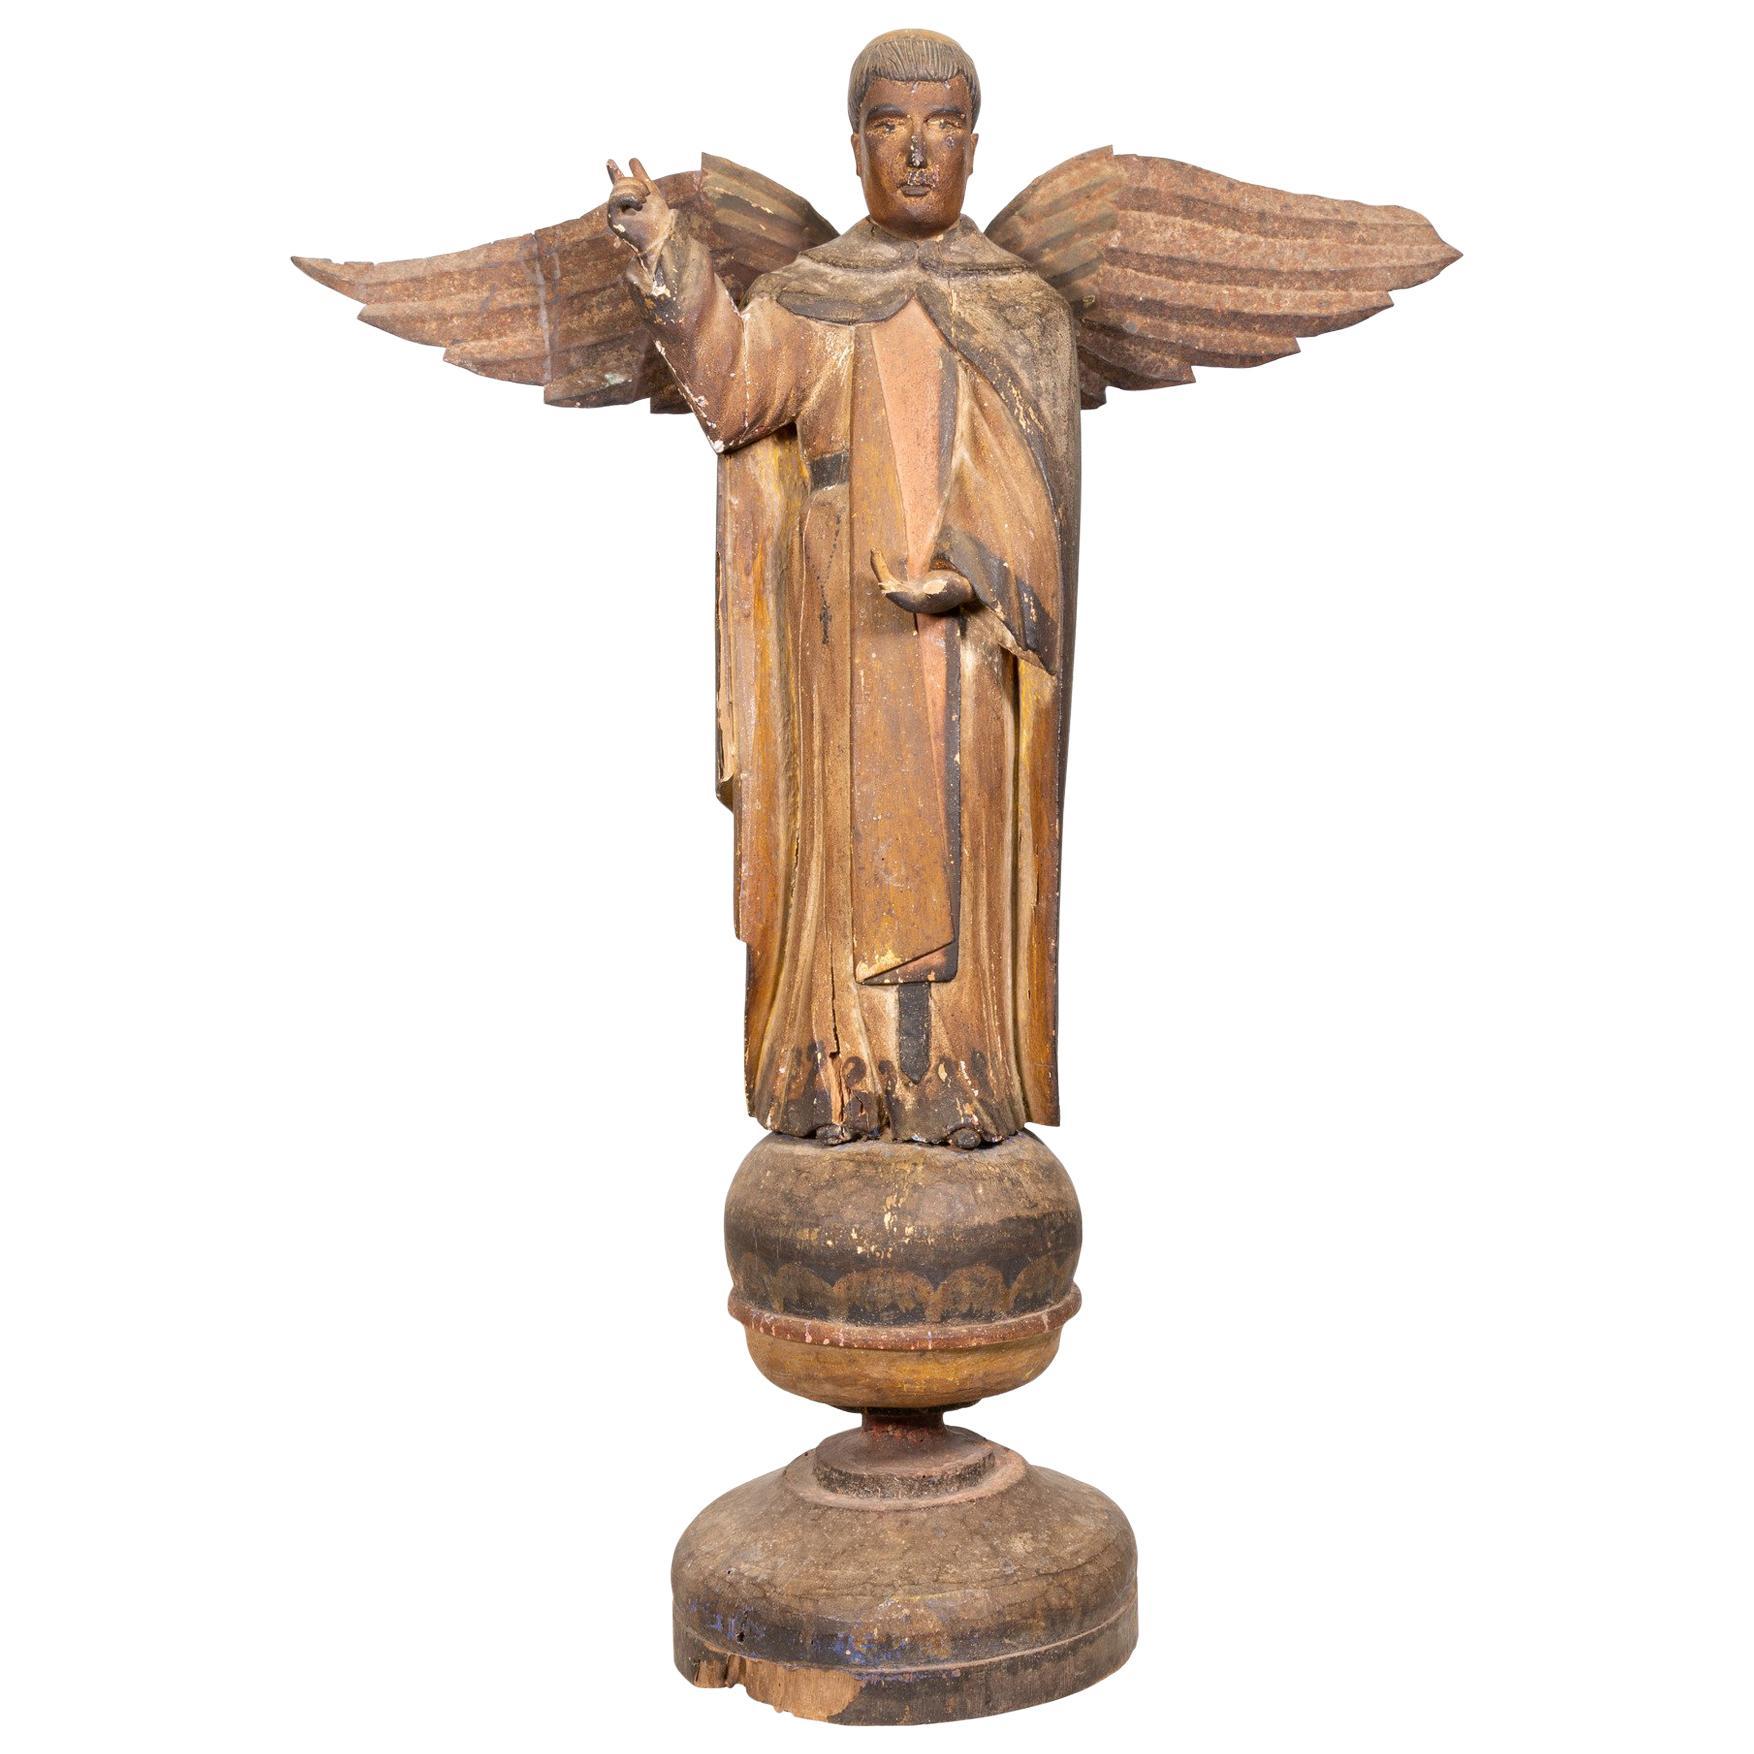 St. Thomas Santos Sculpture